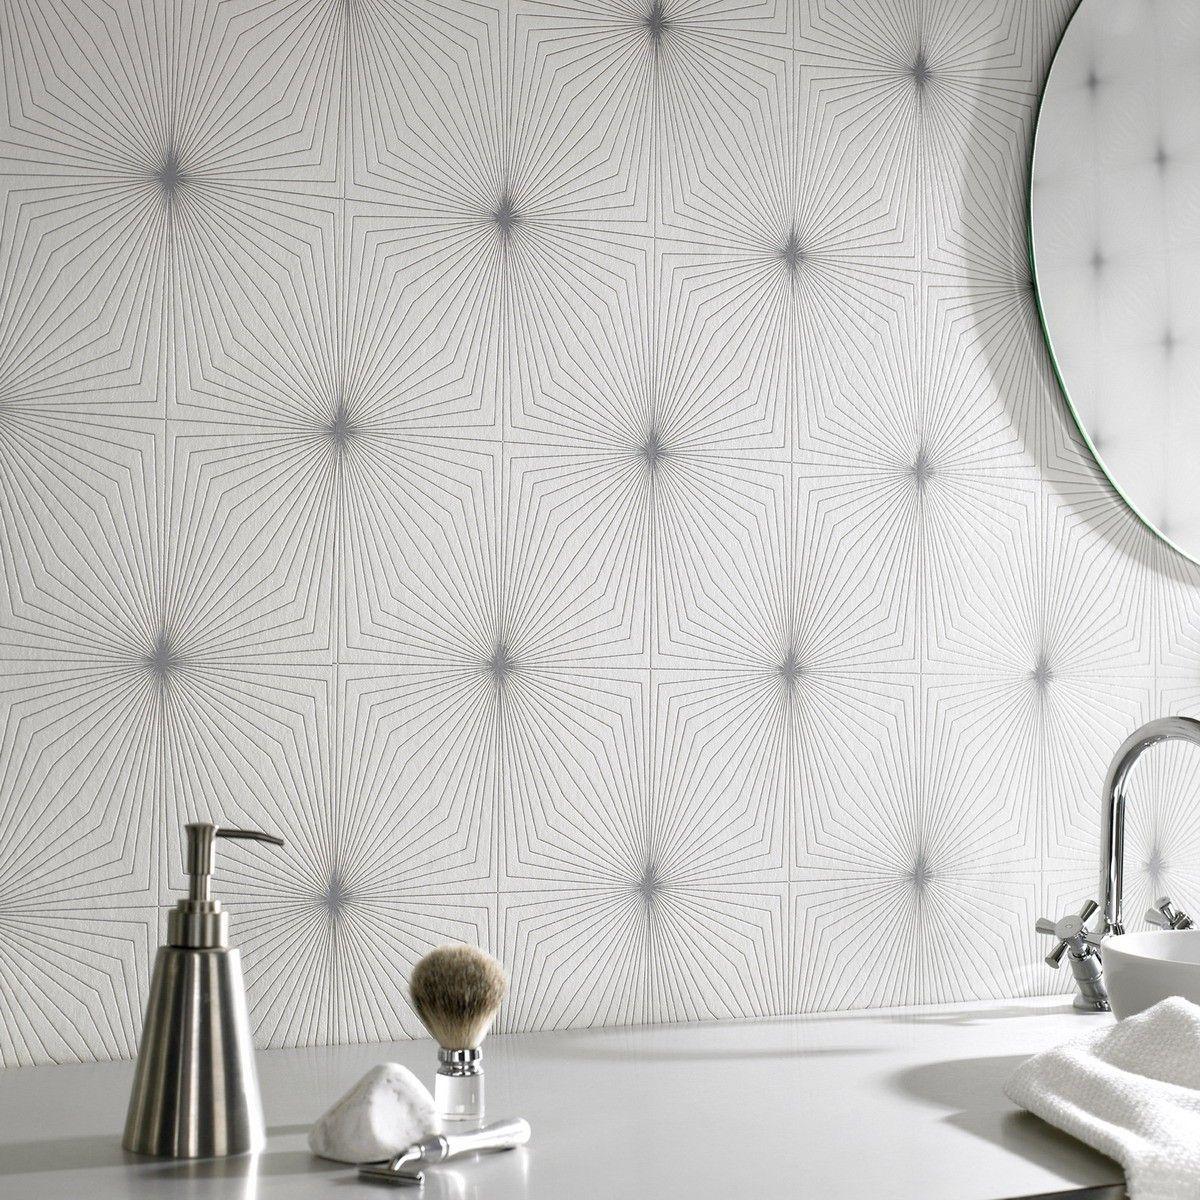 Waterproof Bathroom Wallpaper Ideas For Wetrooms